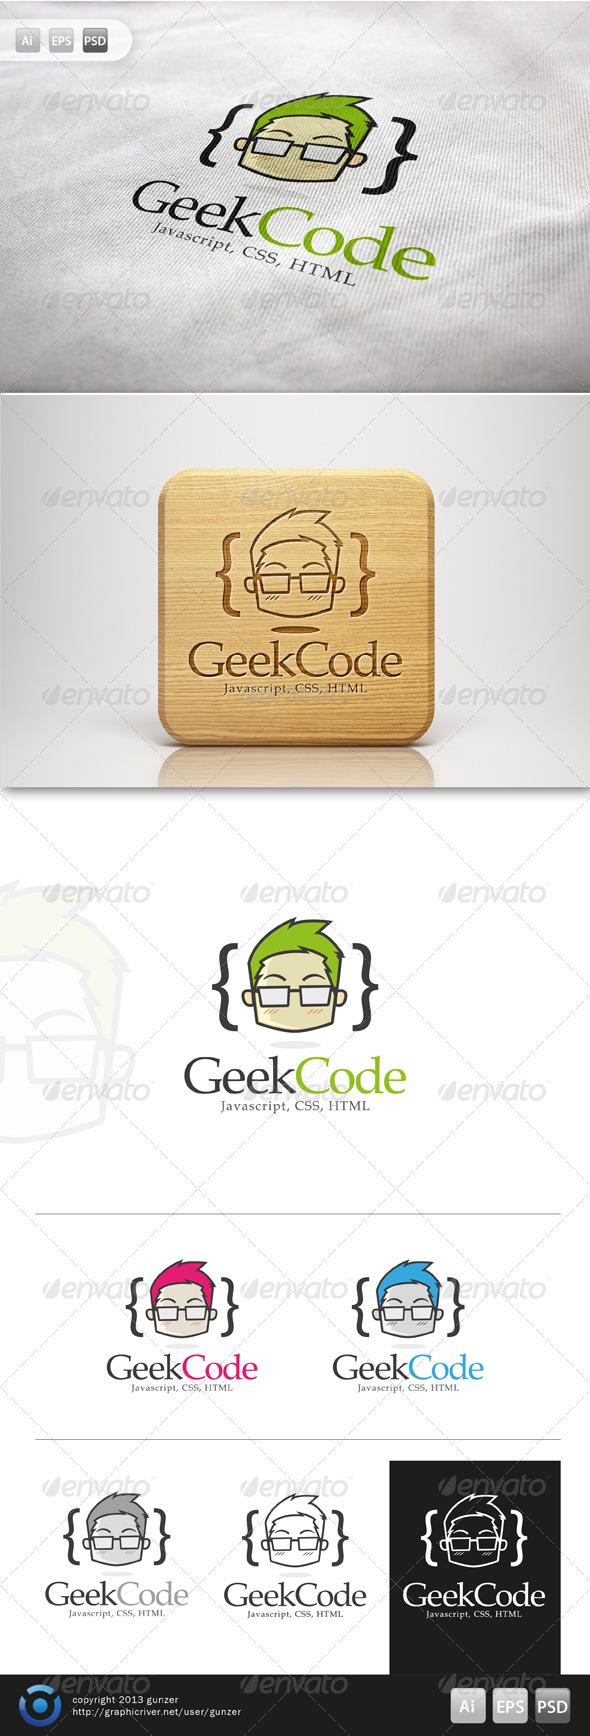 GraphicRiver Geek Code Logo 5760113